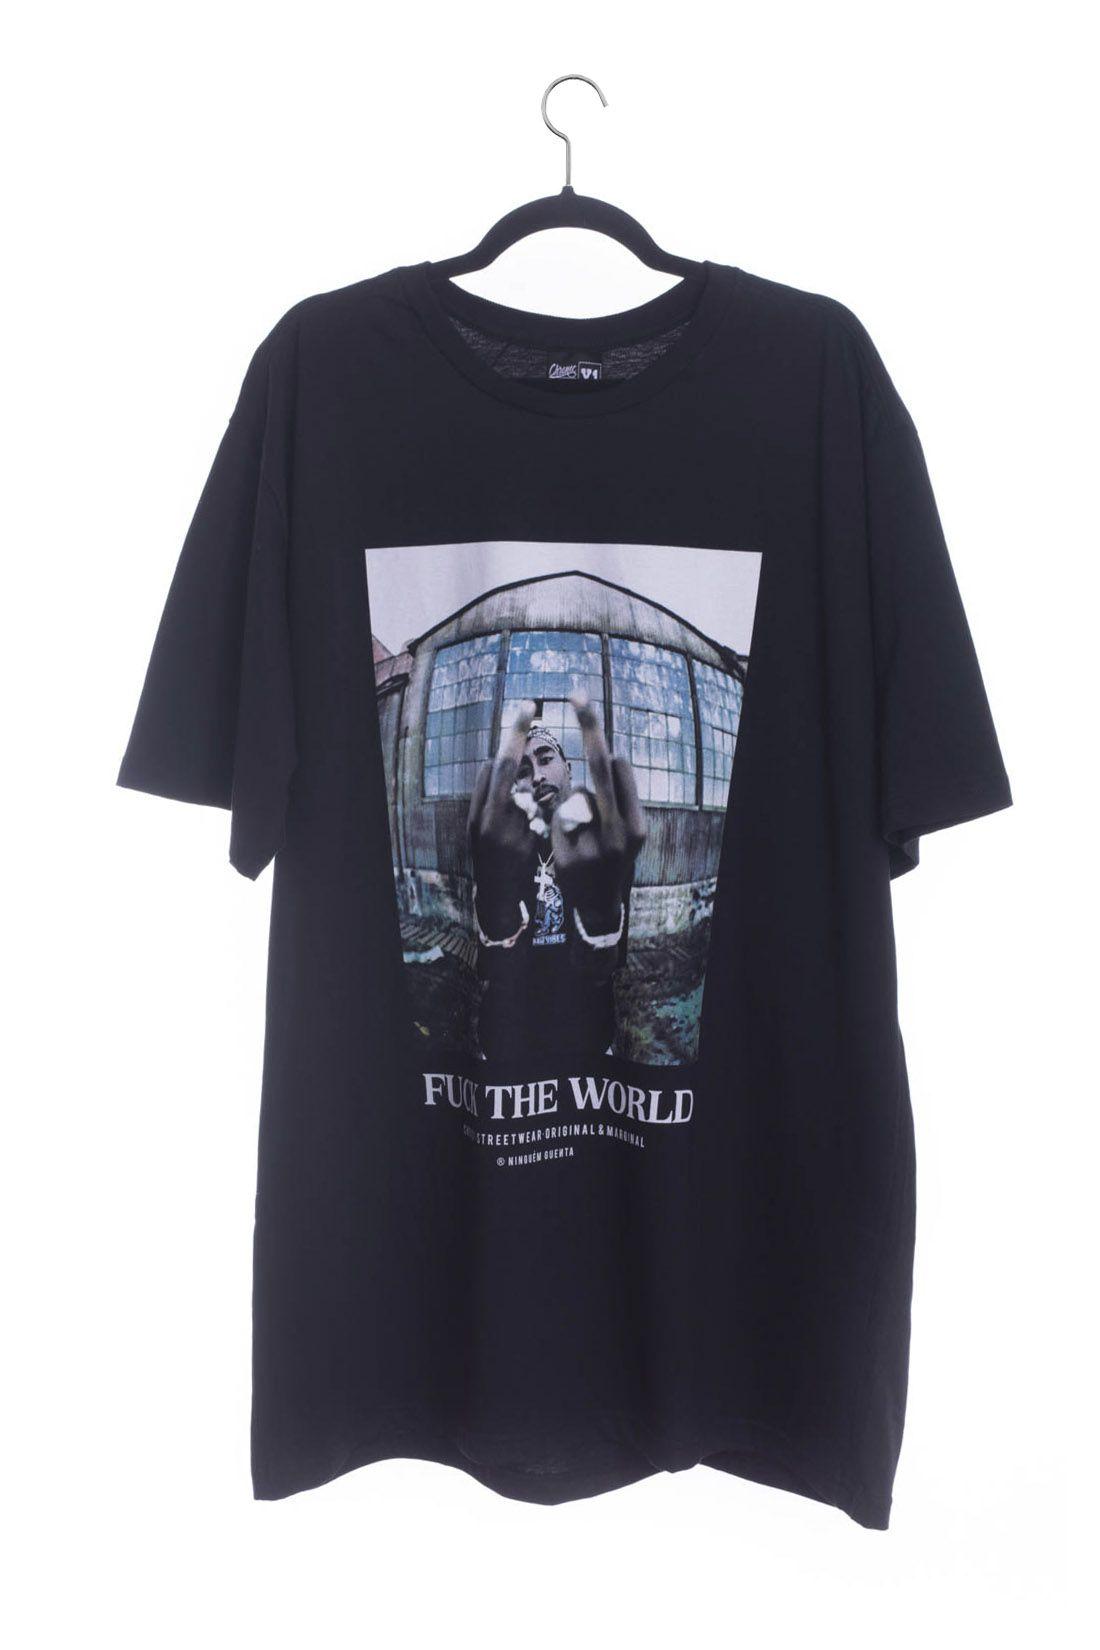 Camiseta Extra Tupac Shakur Chronic